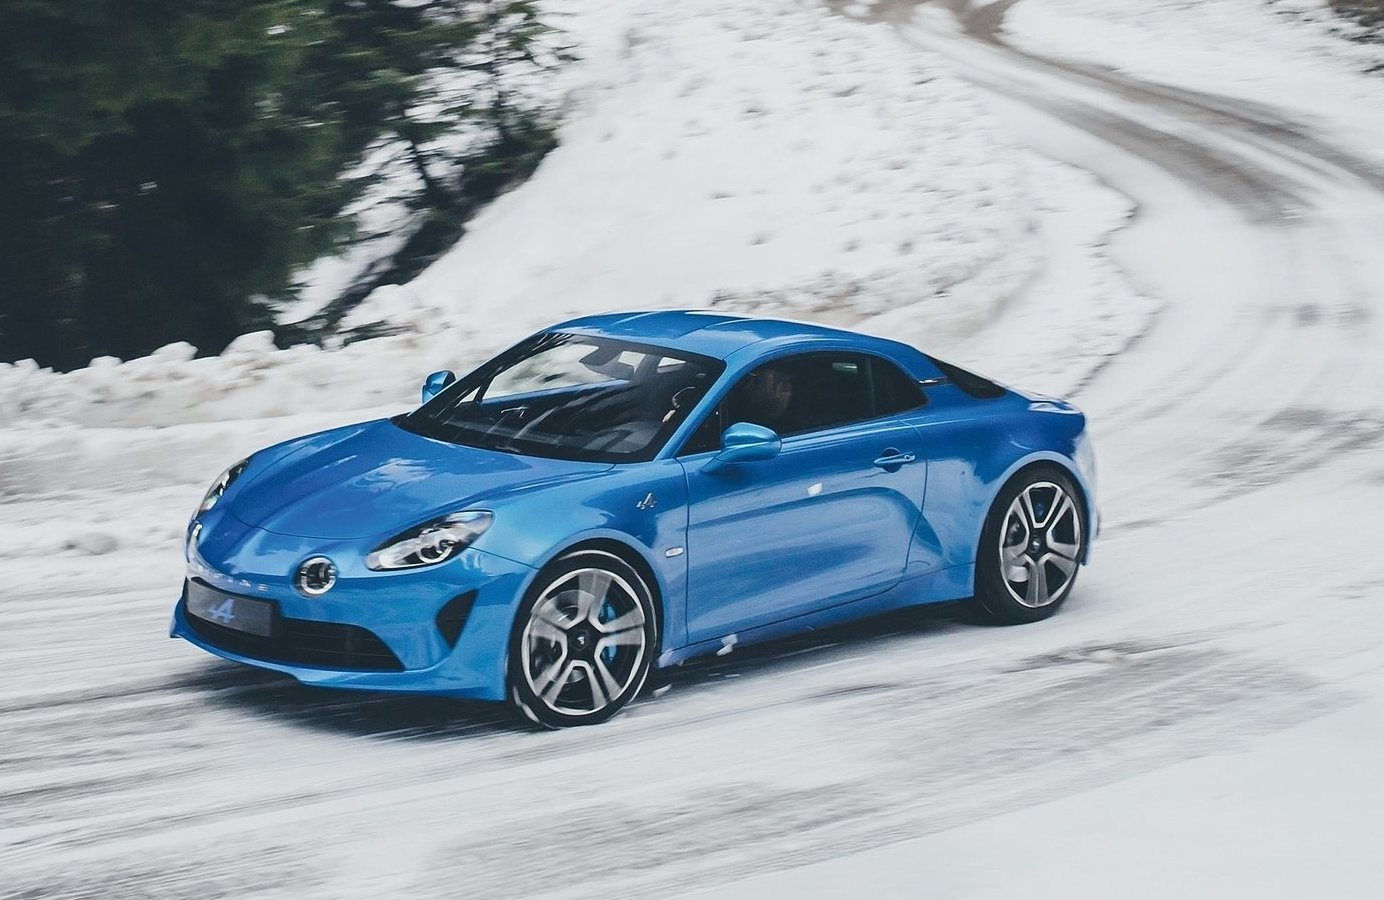 2018 Alpine A110 Confirmed To Go On Sale In Australia Performancedrive